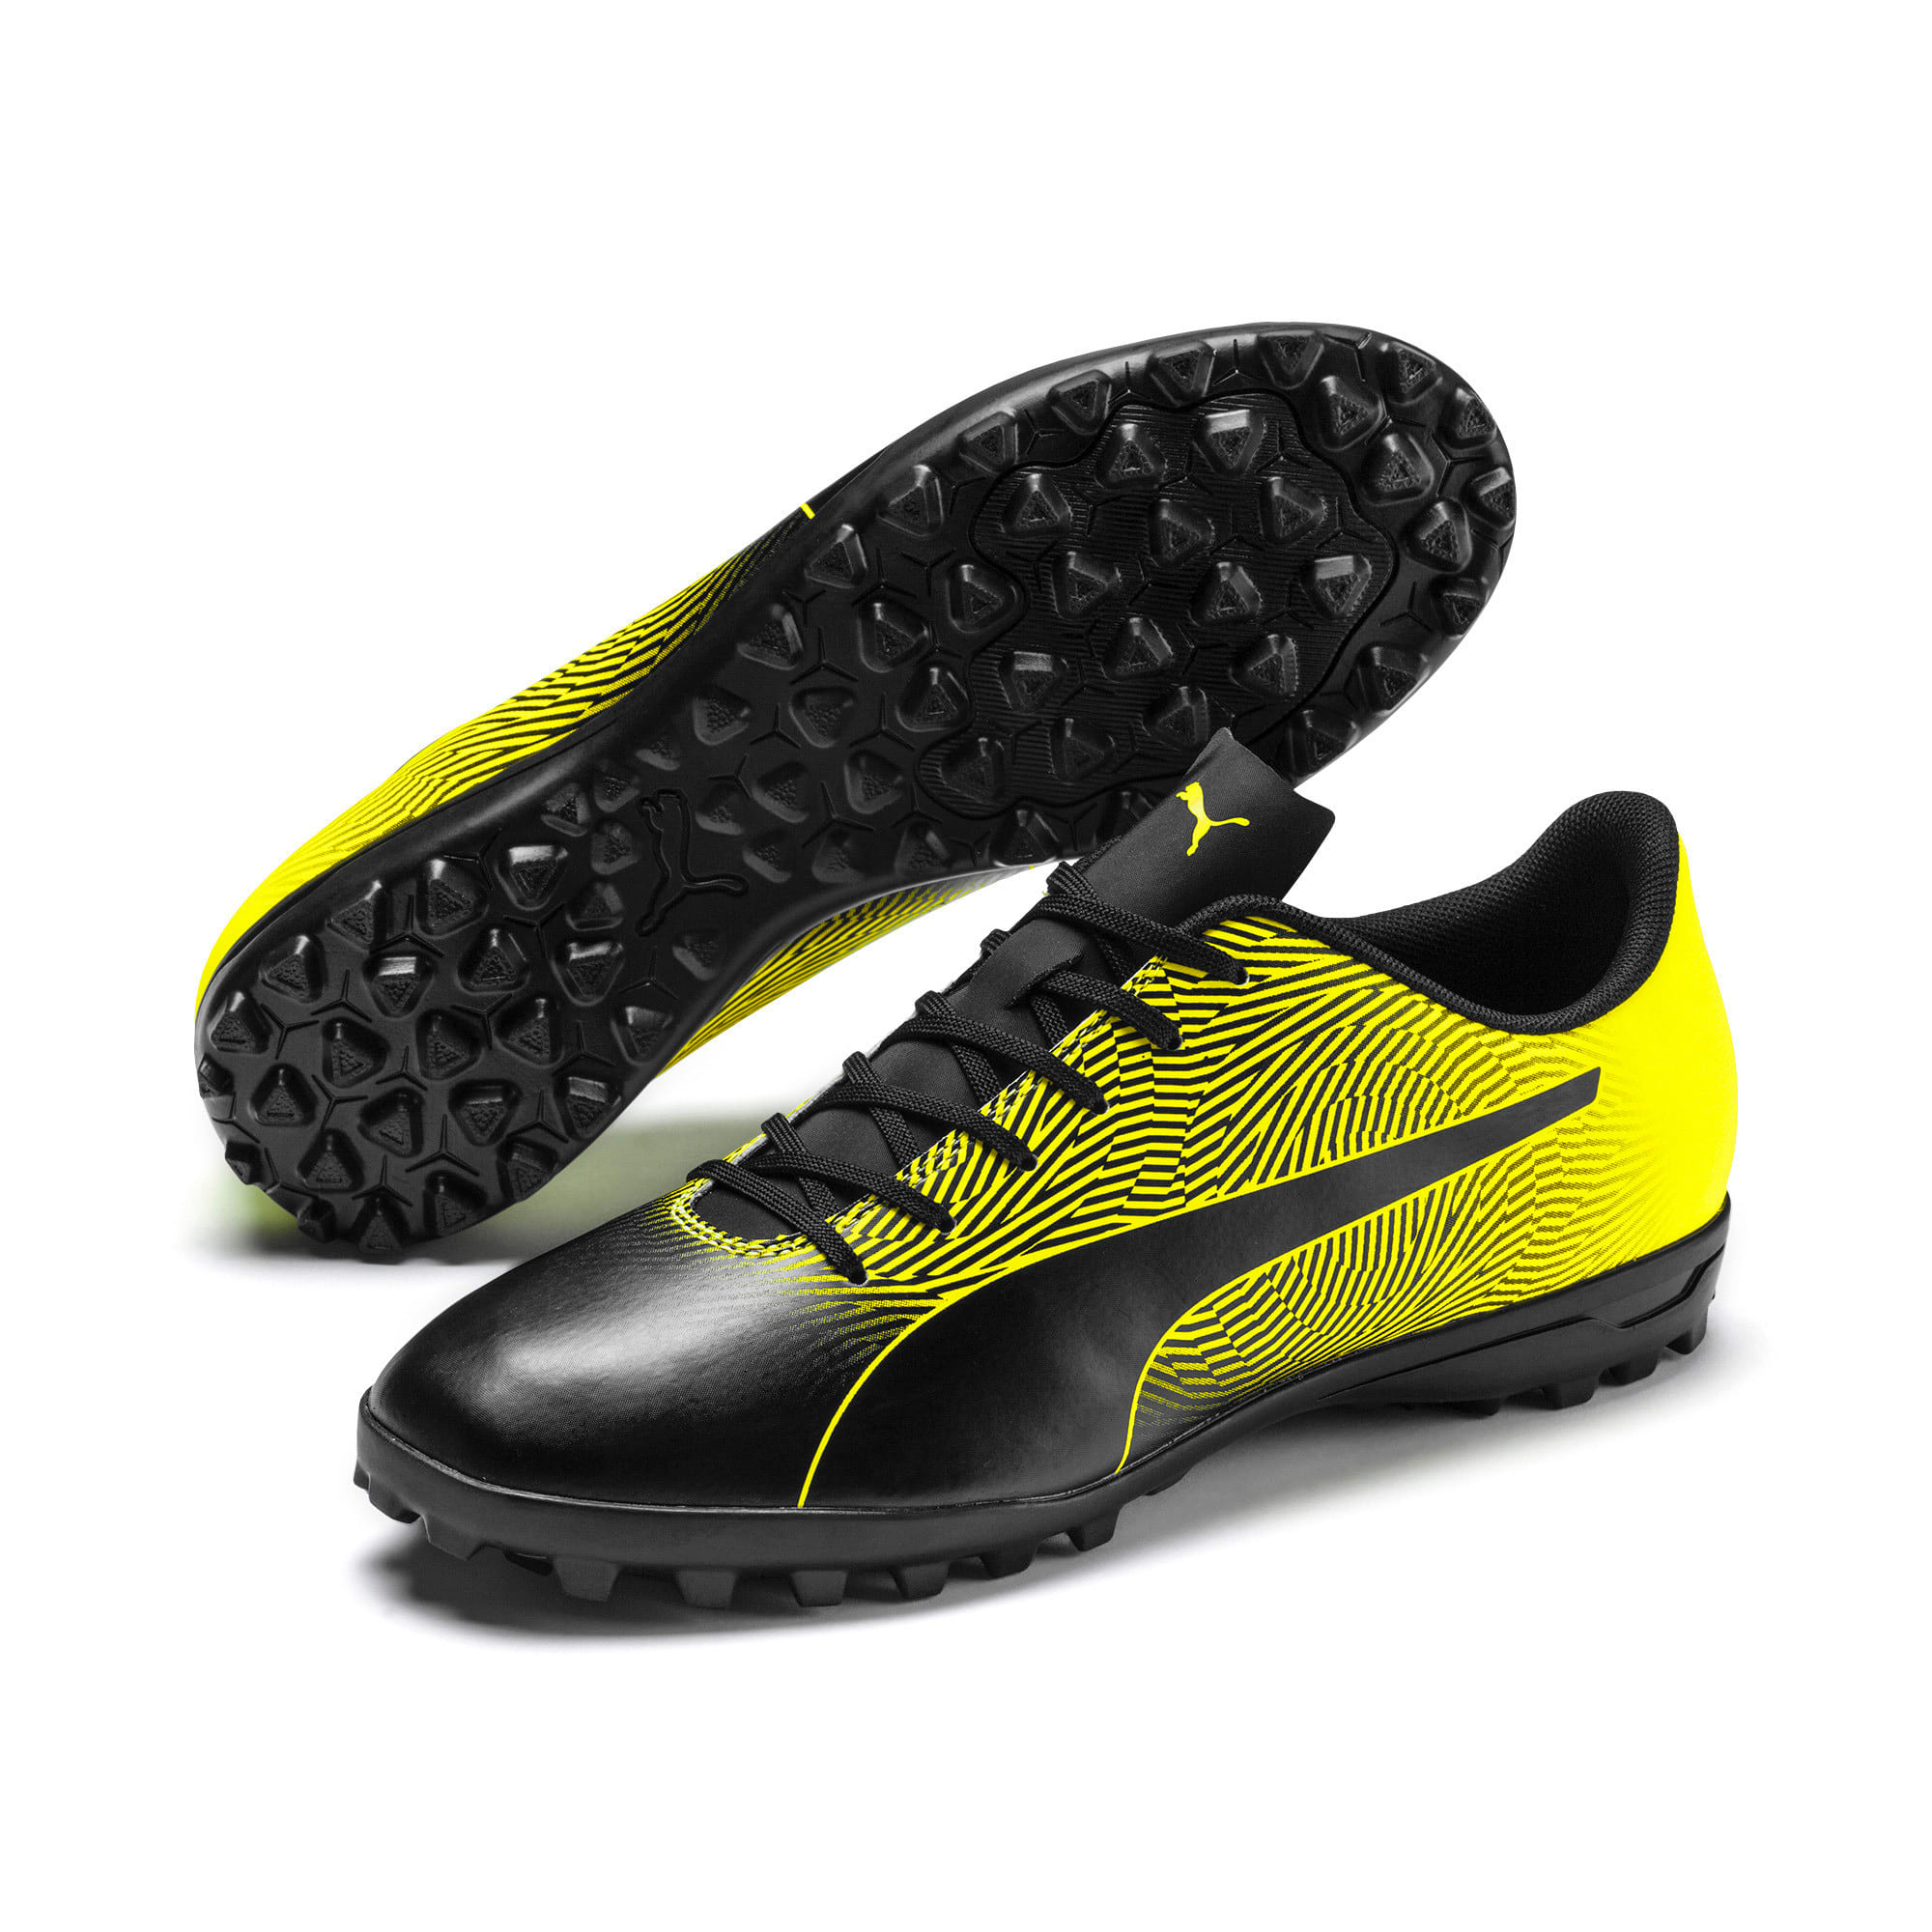 Thumbnail 3 of PUMA Spirit II TT Men's Soccer Shoes, Puma Black-Yellow Alert, medium